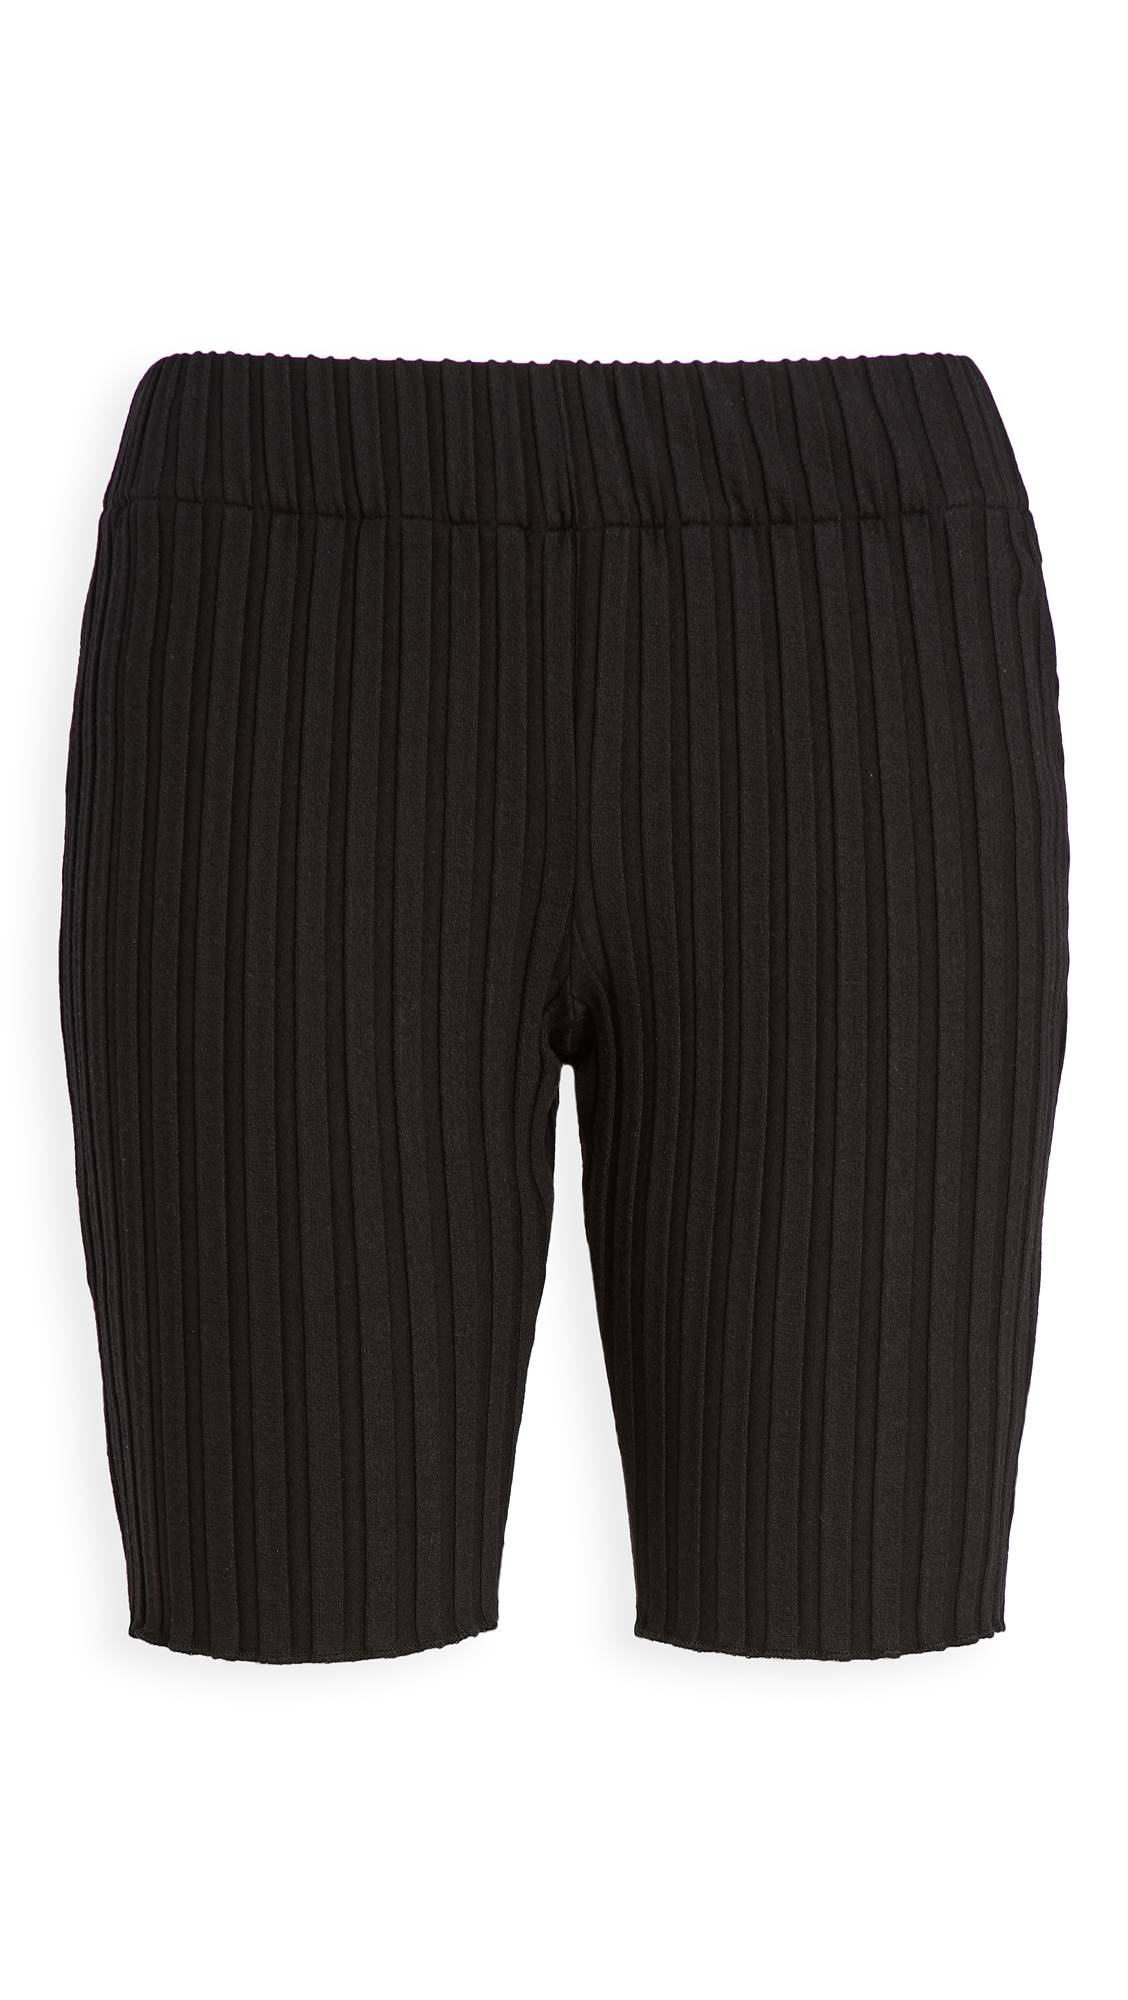 Simon Miller Burr Bike Shorts  - Black - Size: Small